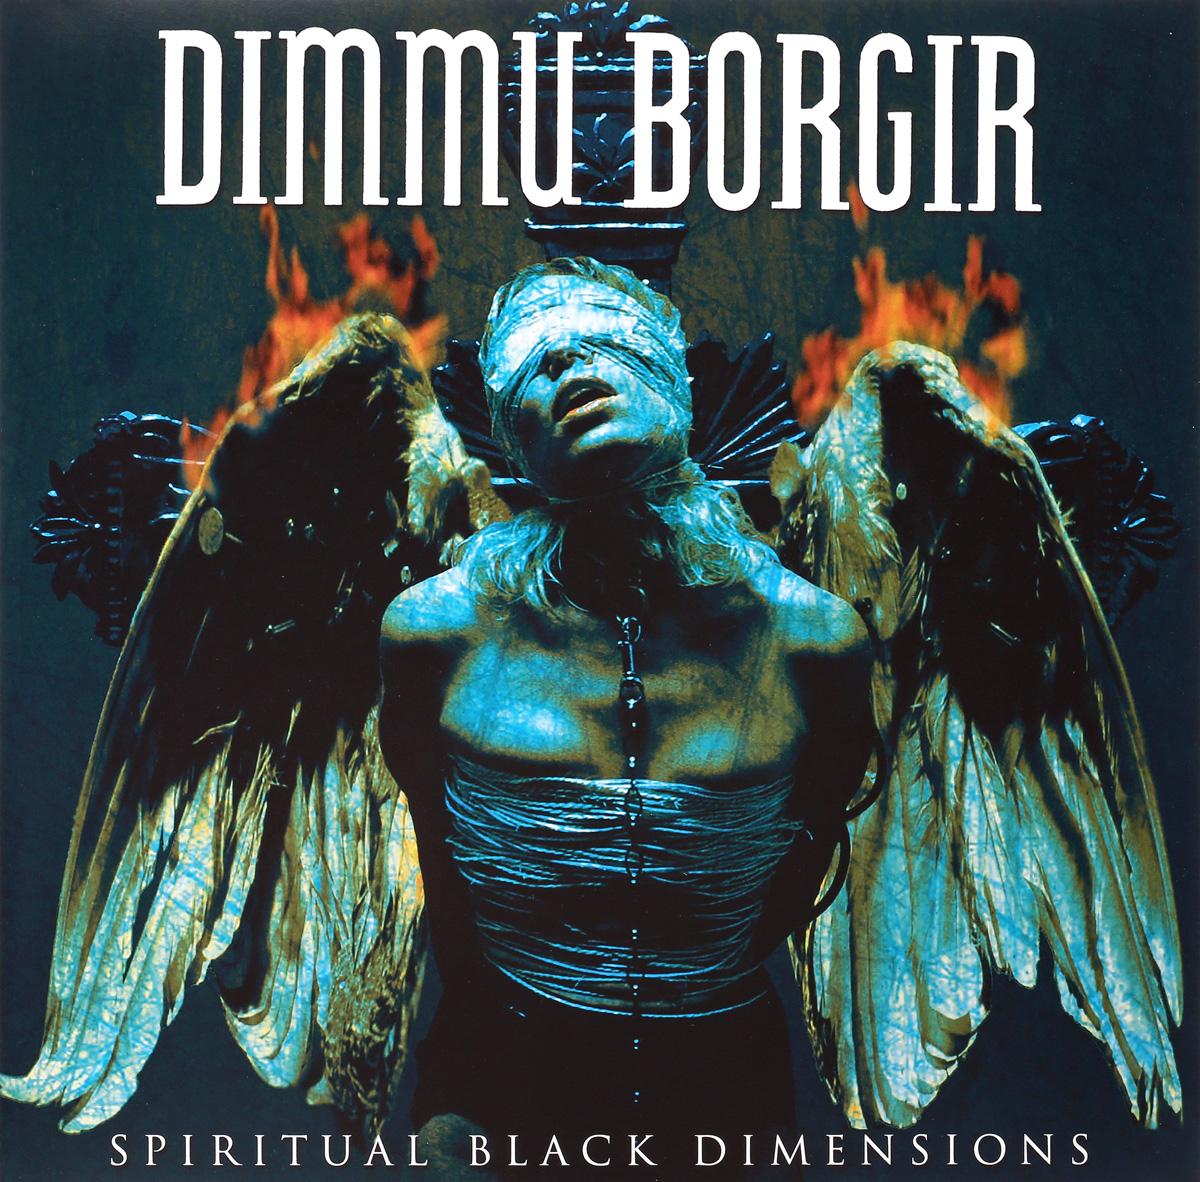 Dimmu Borgir Dimmu Borgir. Spiritual Black Dimensions (LP) 7183 dms dimensions dimensions